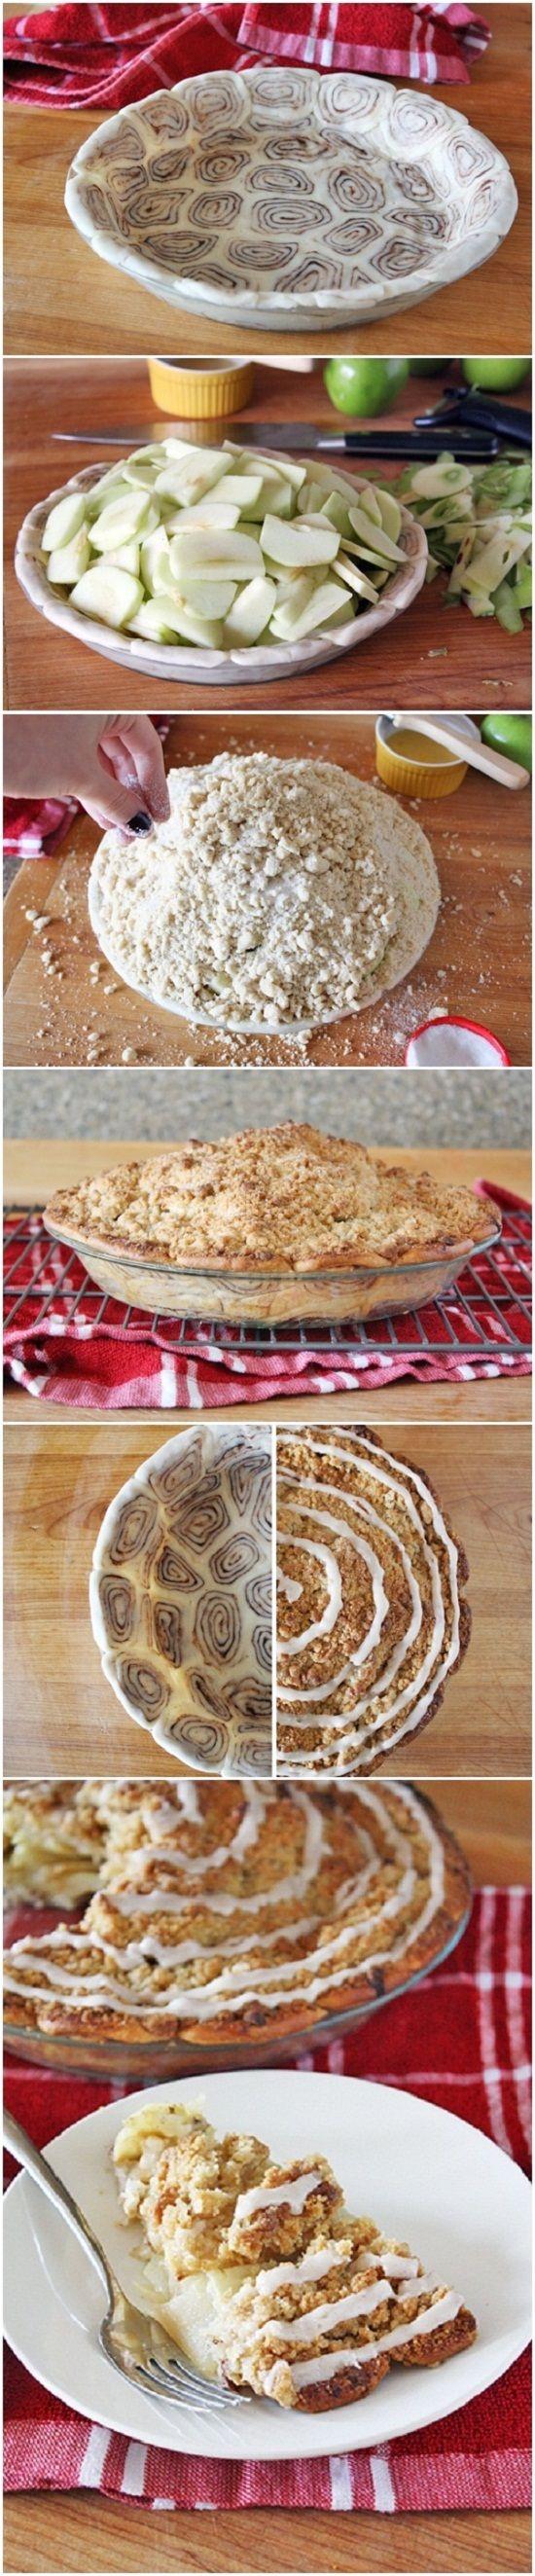 Cinnamon Roll Apple Pie Interesting crust idea